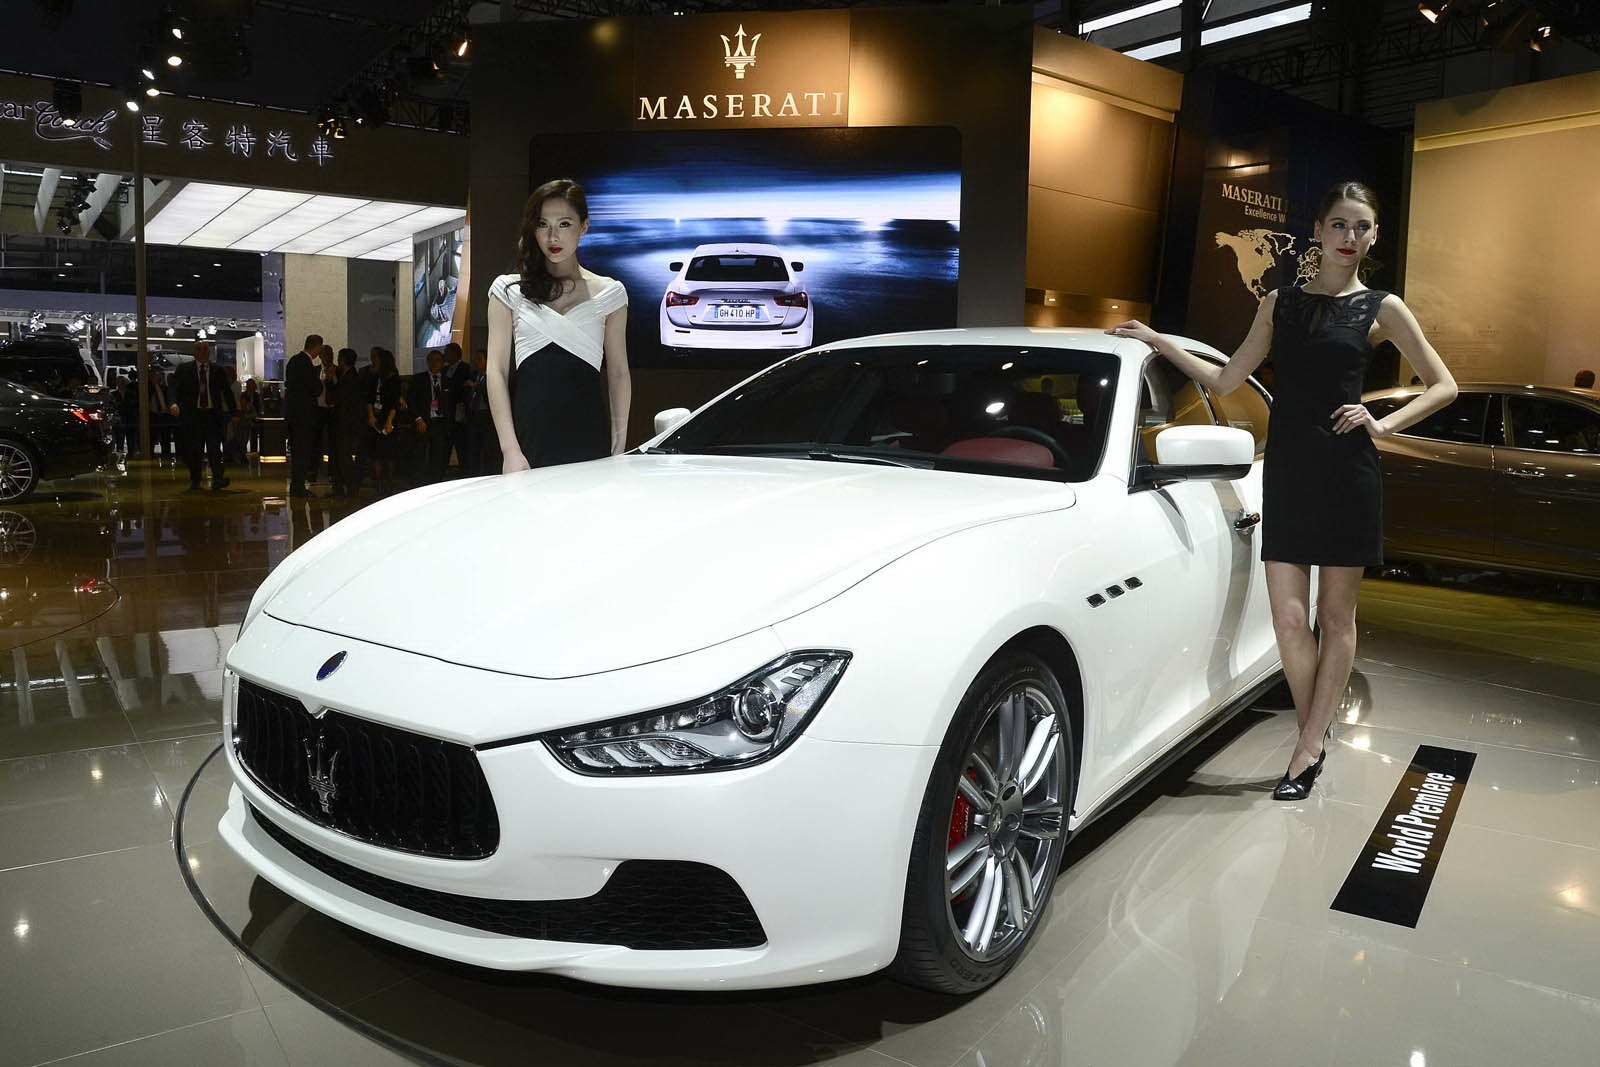 [Image: Maserati-Ghibli-11%25255B2%25255D.jpg]